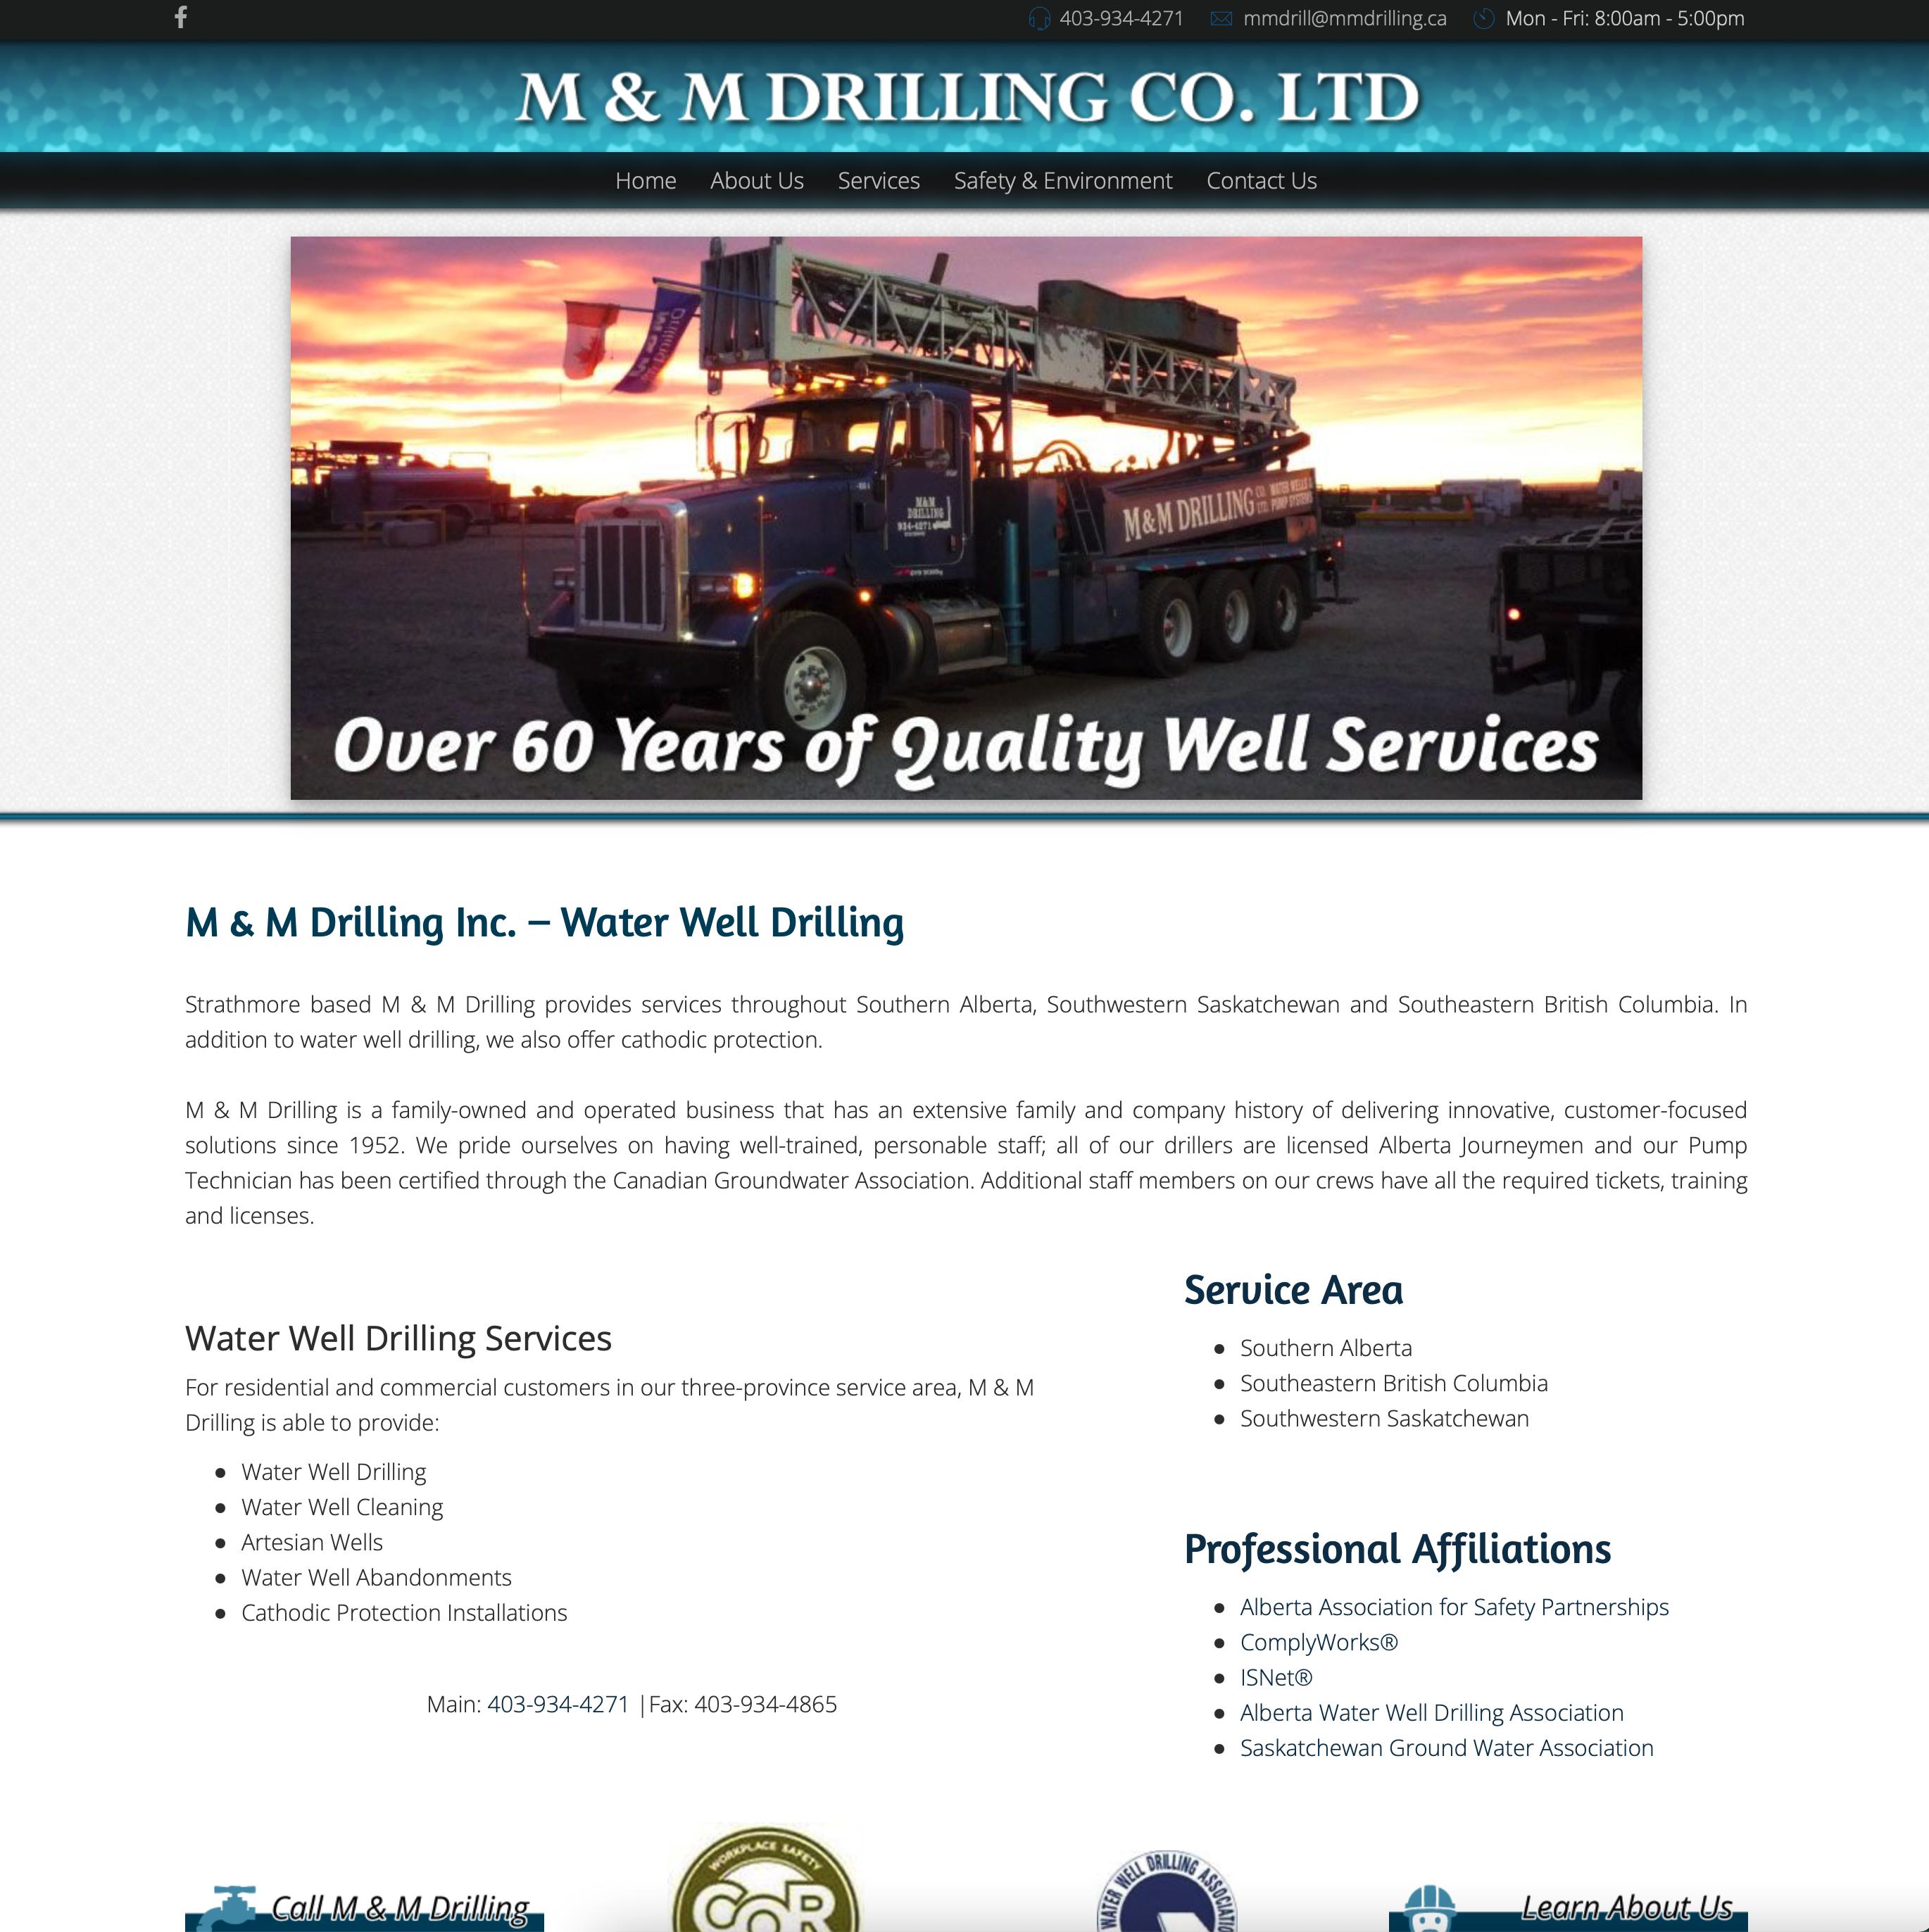 M&M Drilling